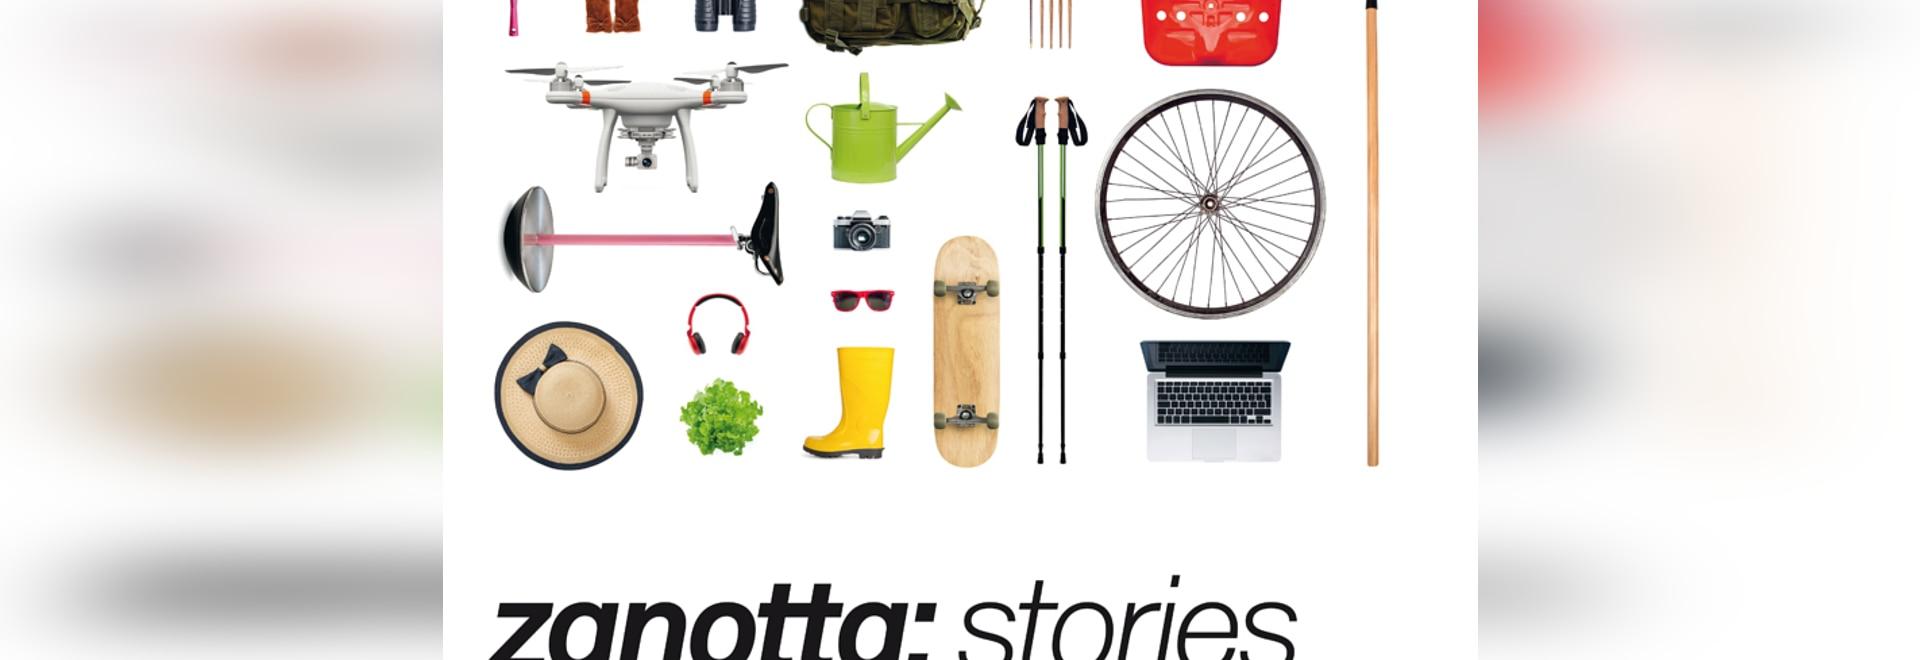 Tecno présente des histoires de Zanotta